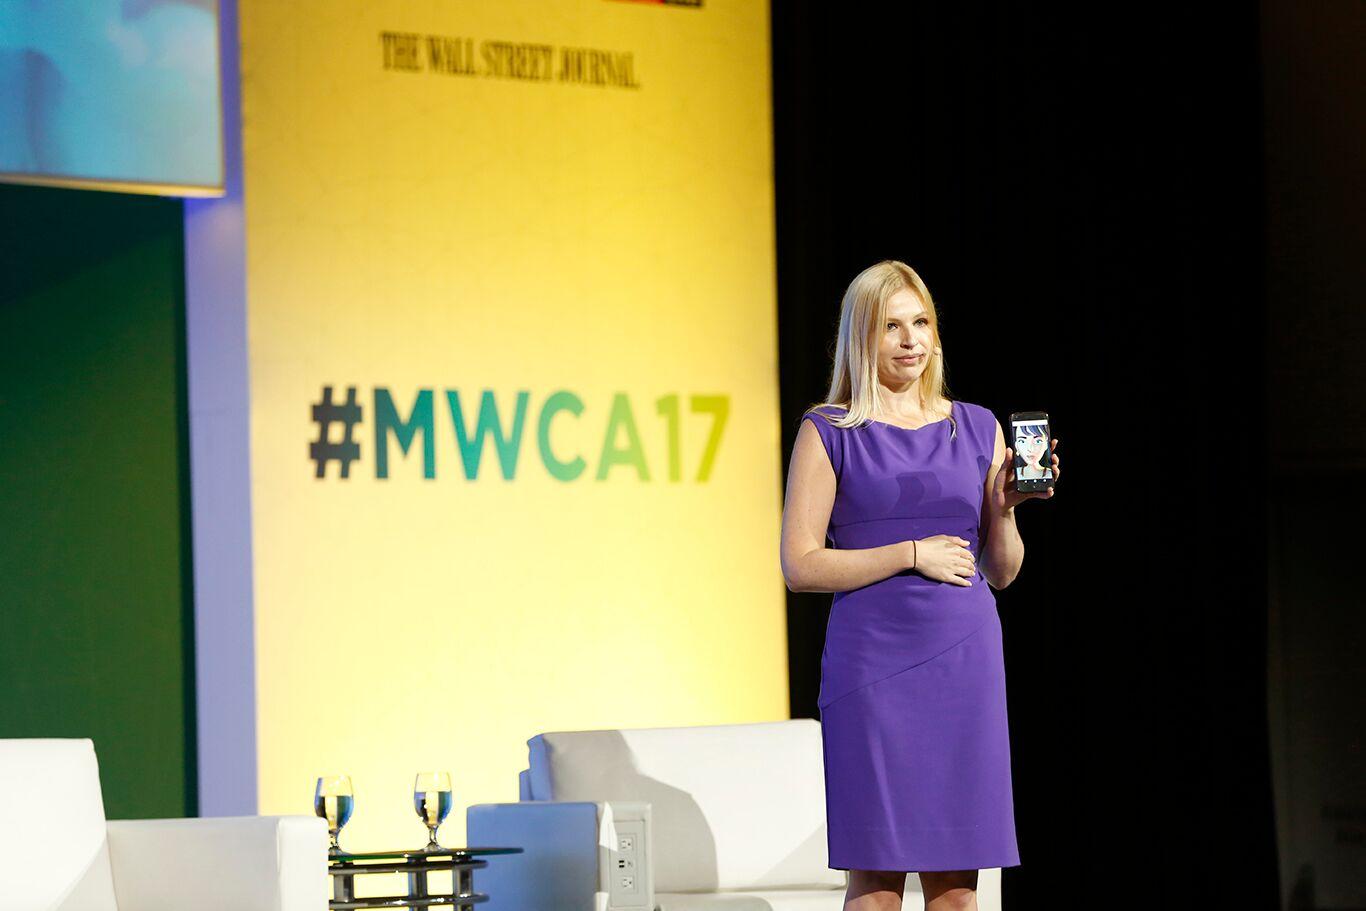 Pandorabots urges brands to go bots batty - Mobile World Live